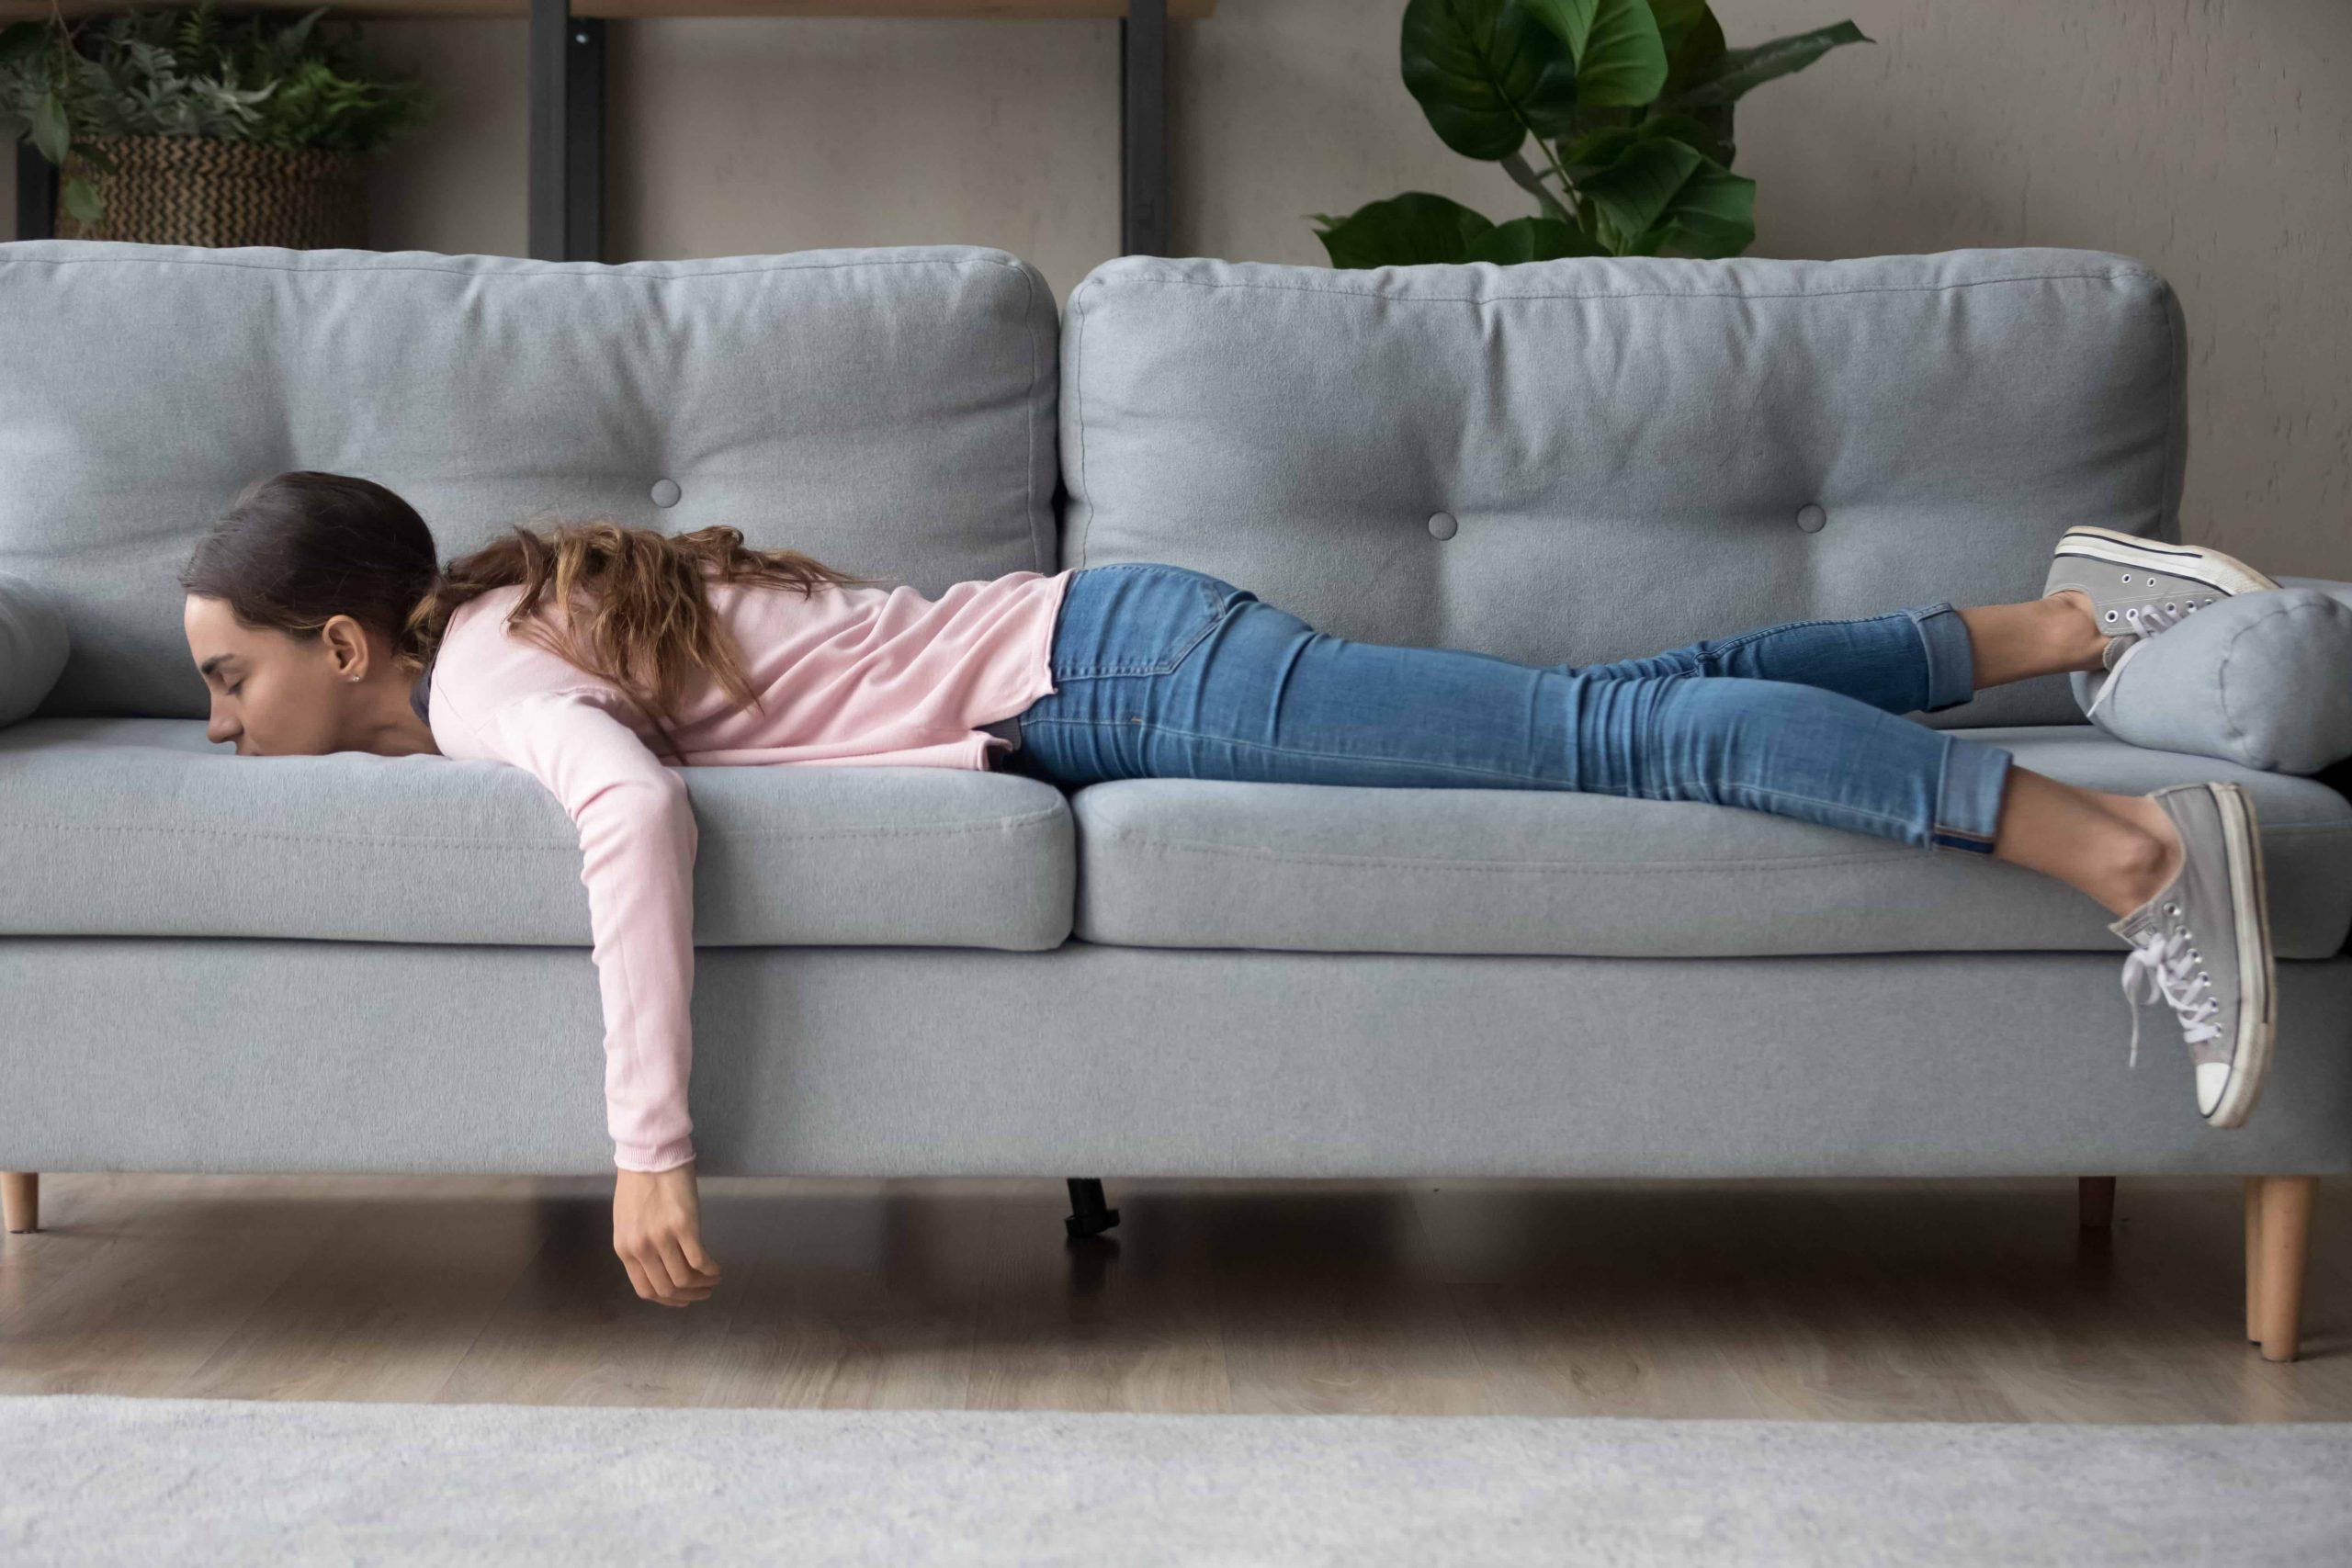 Tired girl lying on a sofa